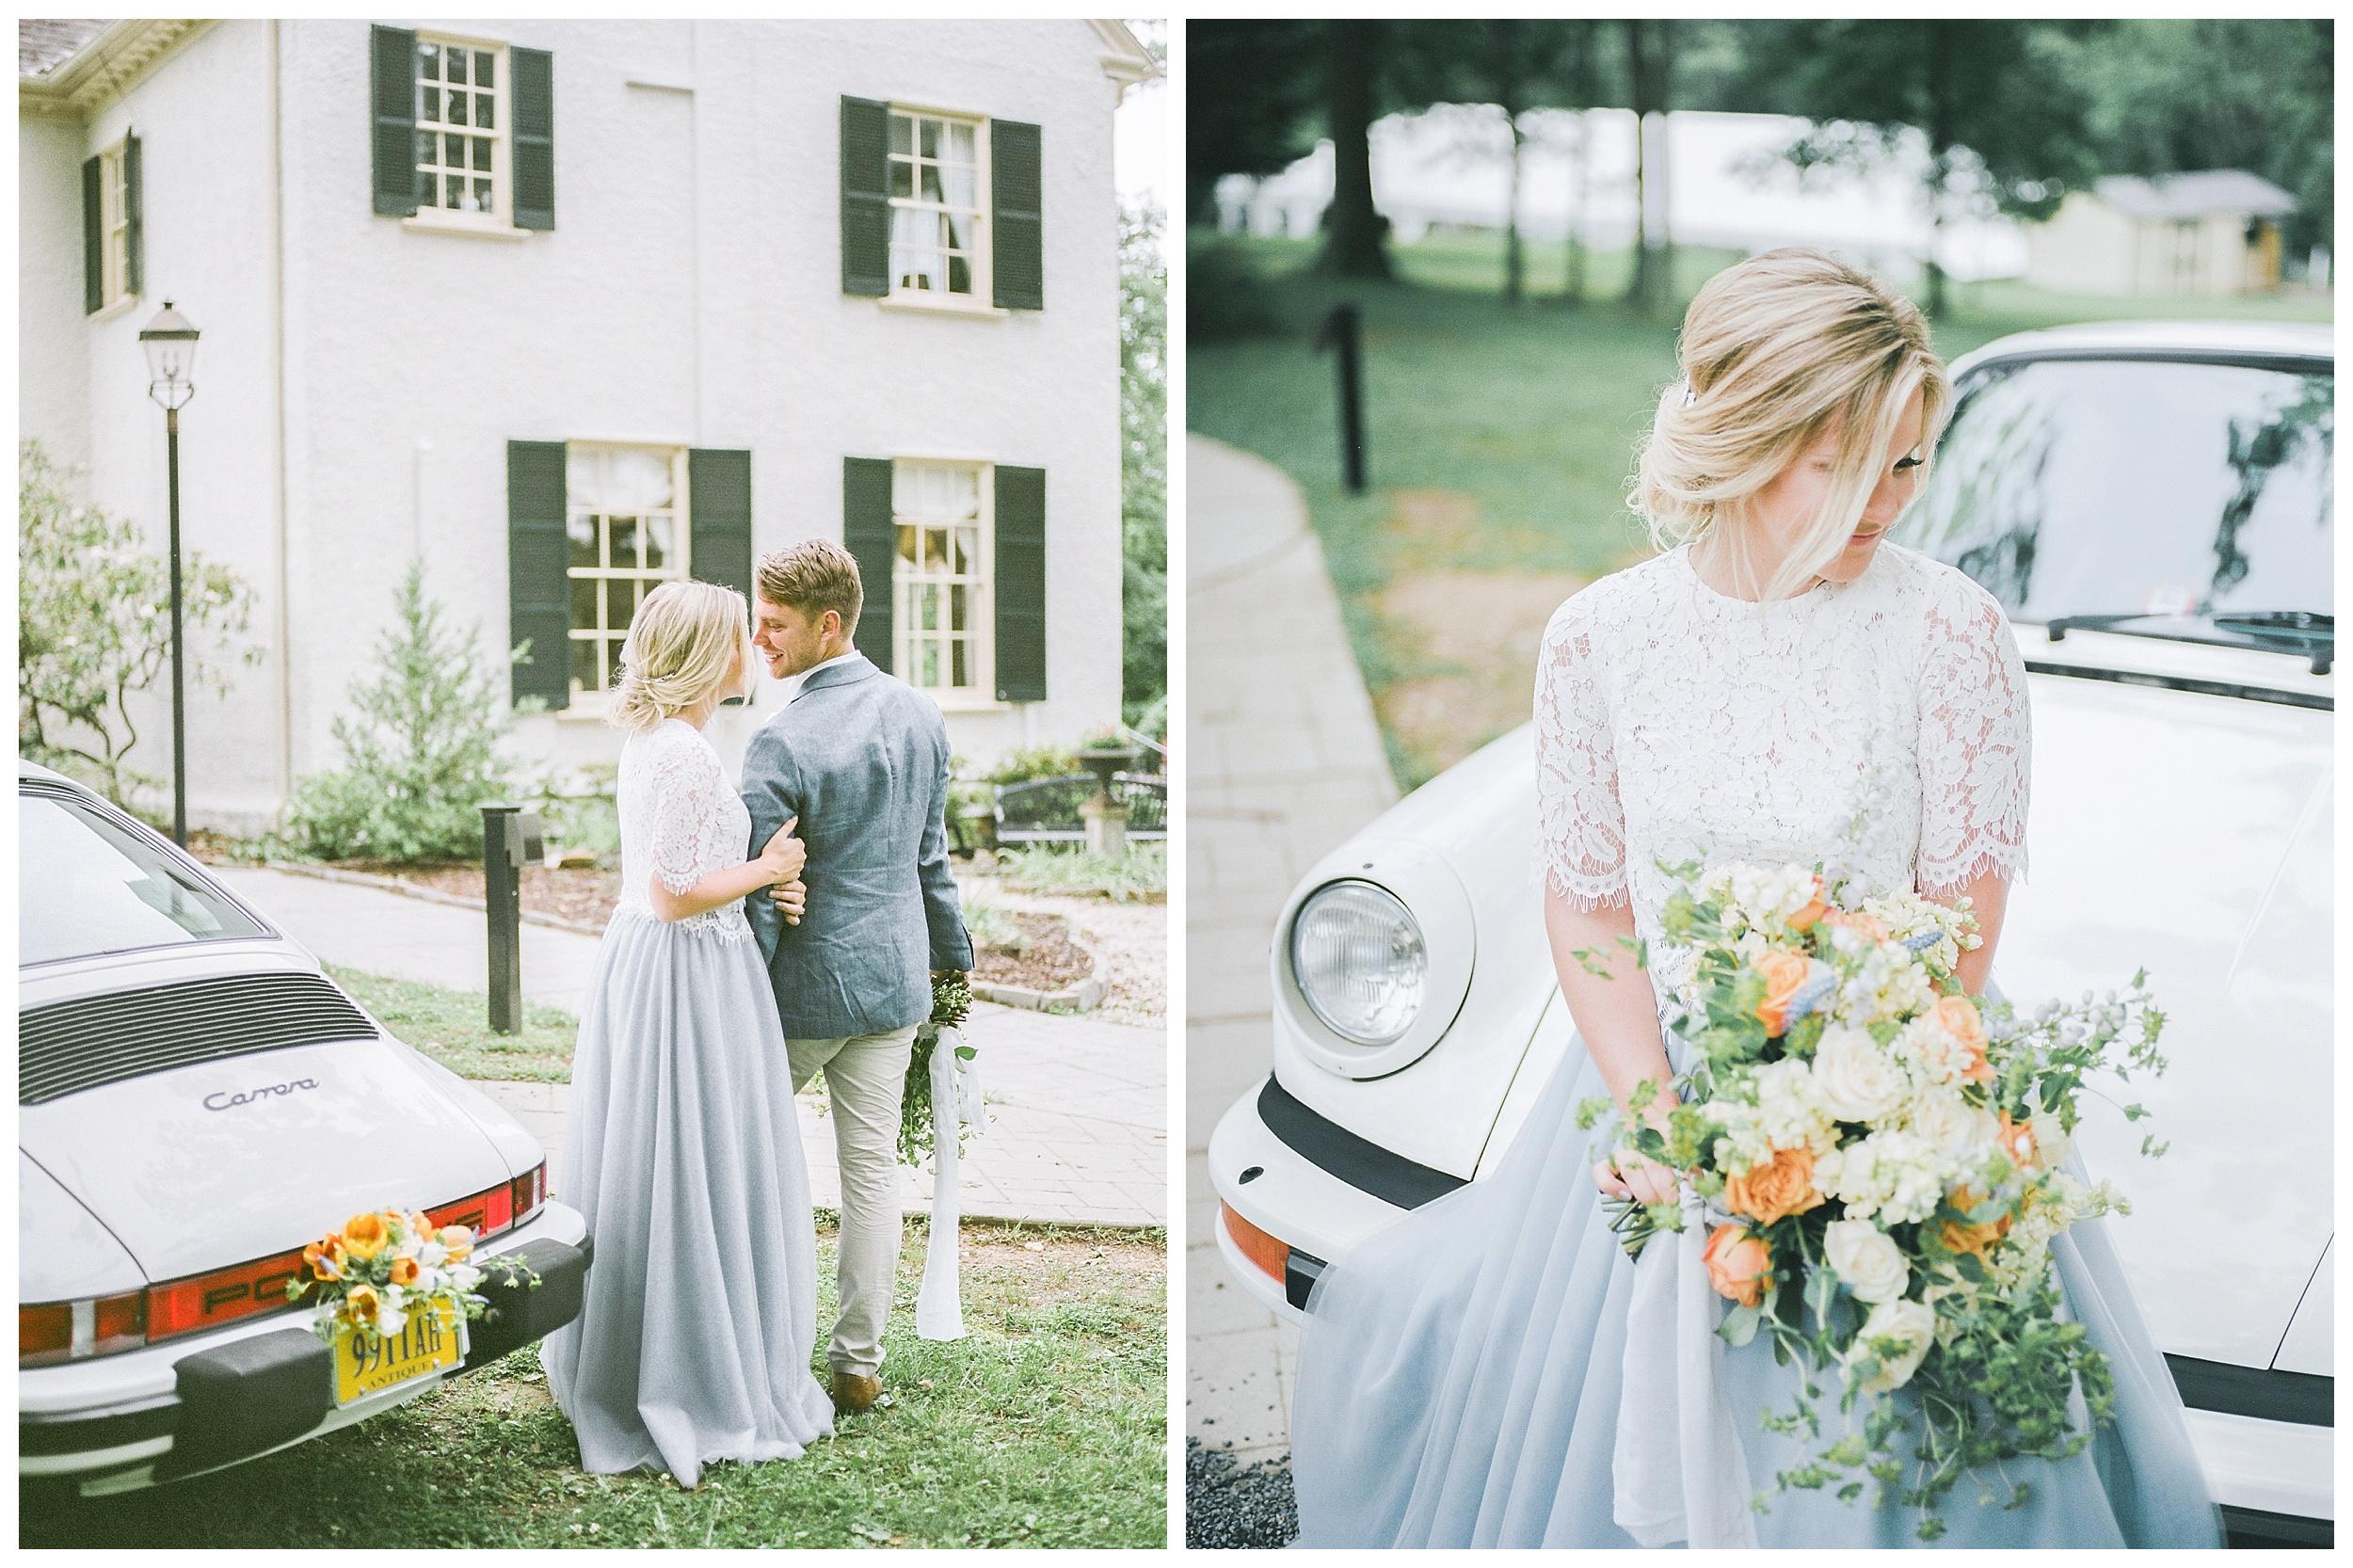 Rust Manor Wedding   Virginia Wedding Photographer Kir Tuben_0057.jpg